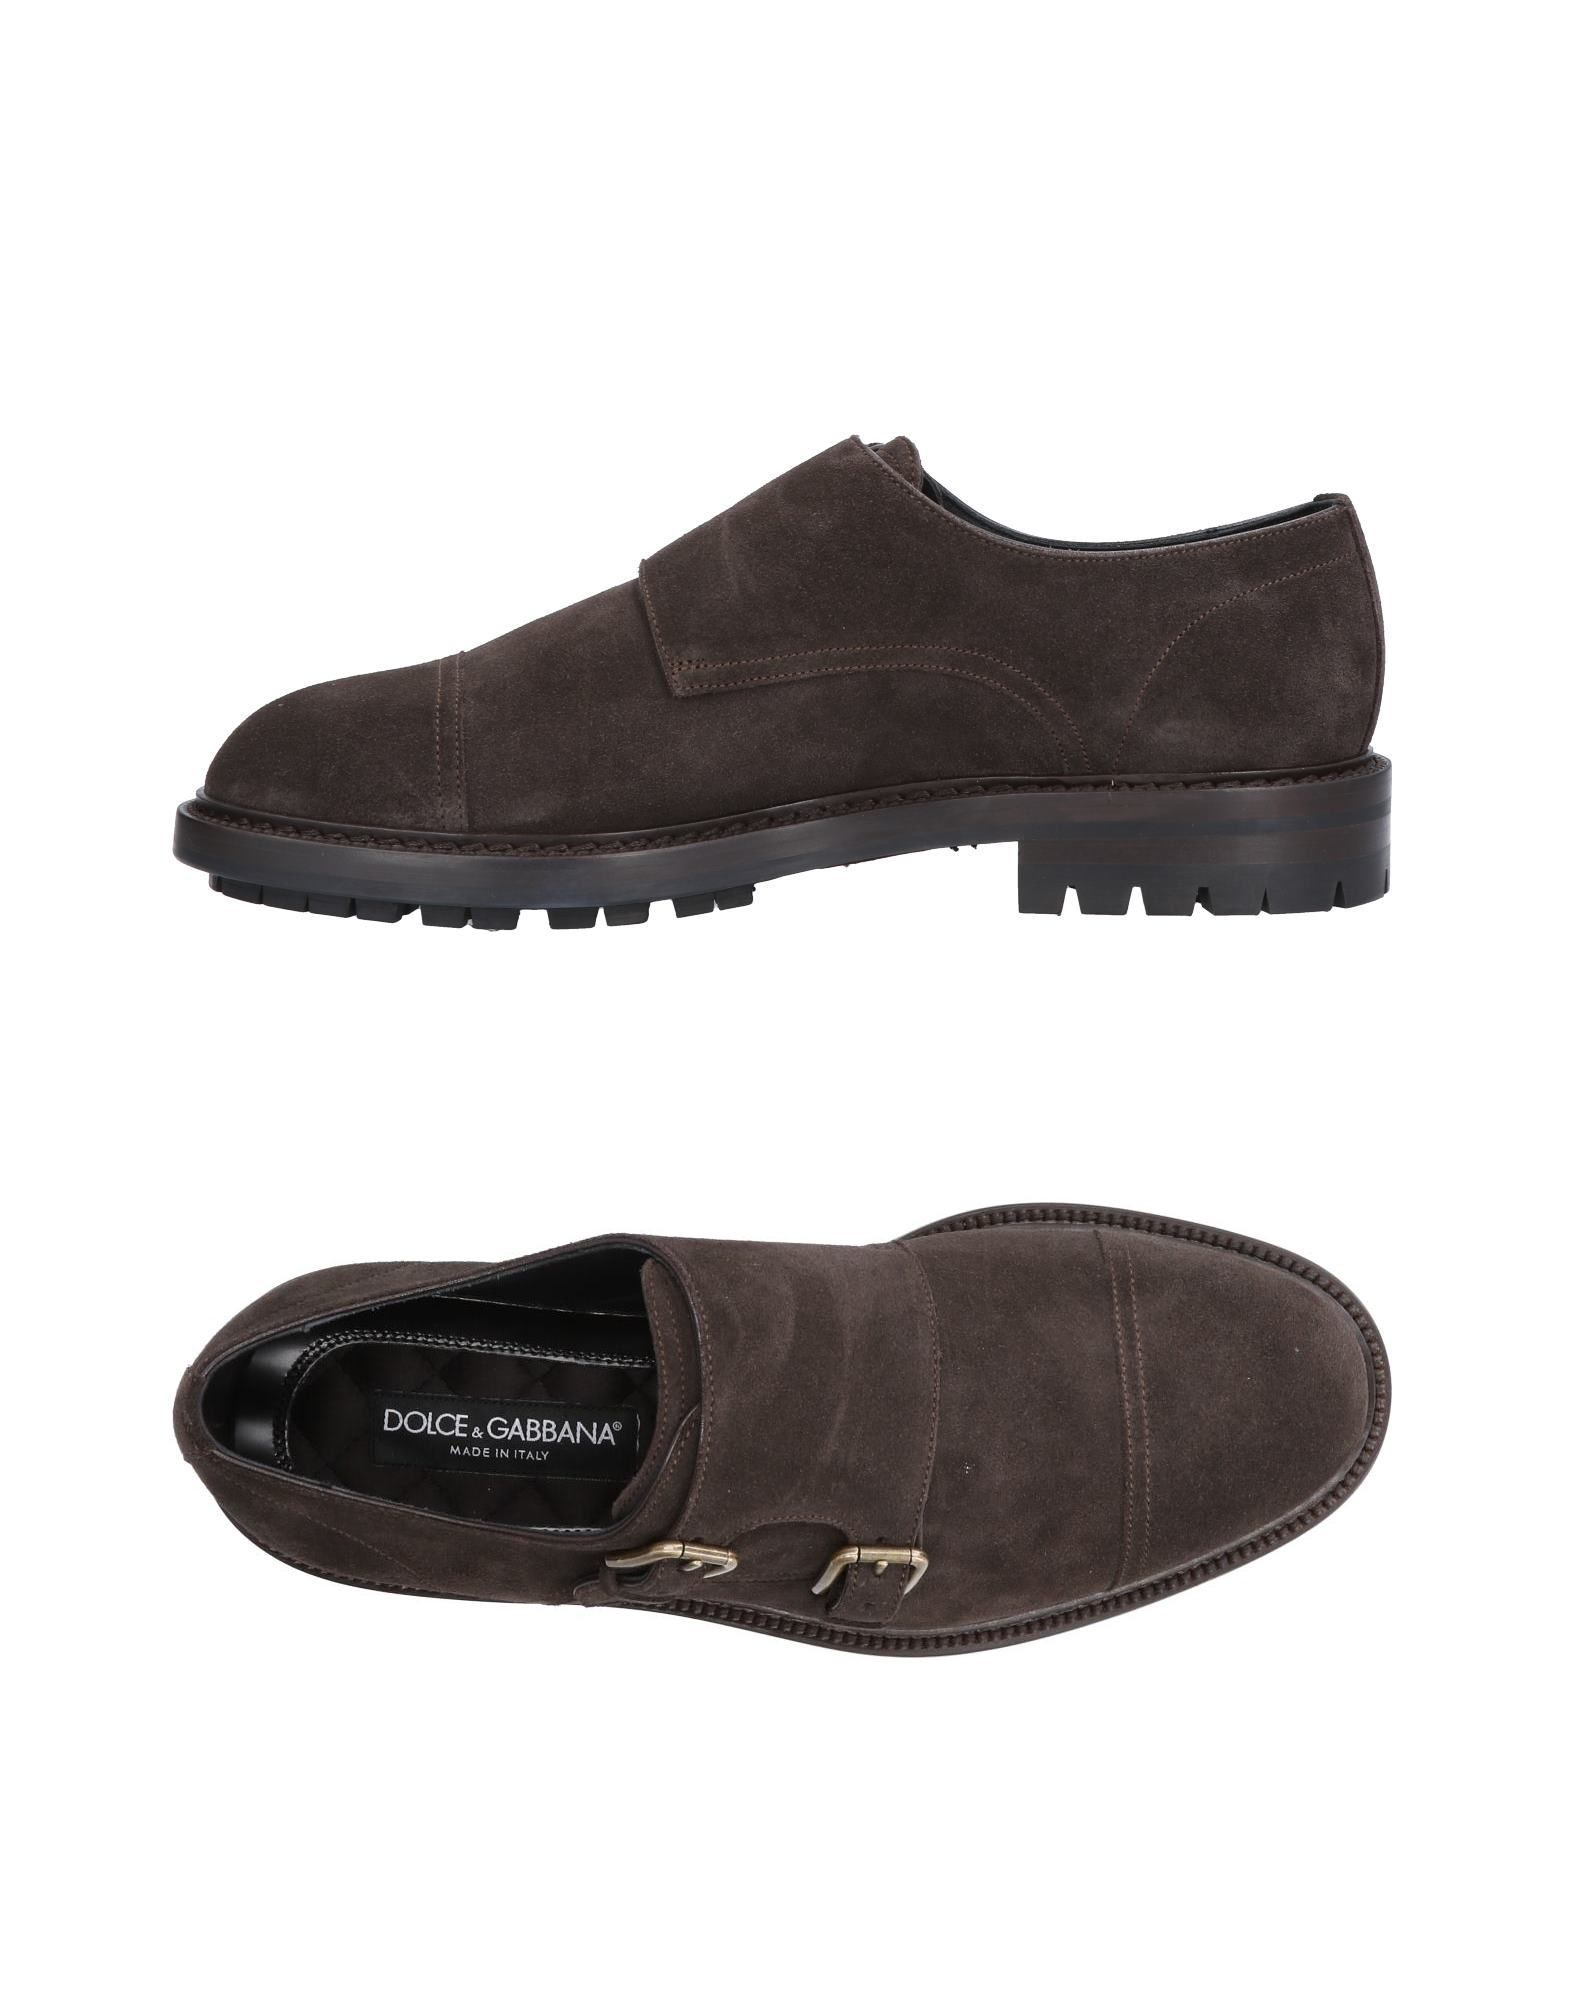 Dolce & Gabbana Mokassins Herren  11488685IV Gute Qualität beliebte Schuhe